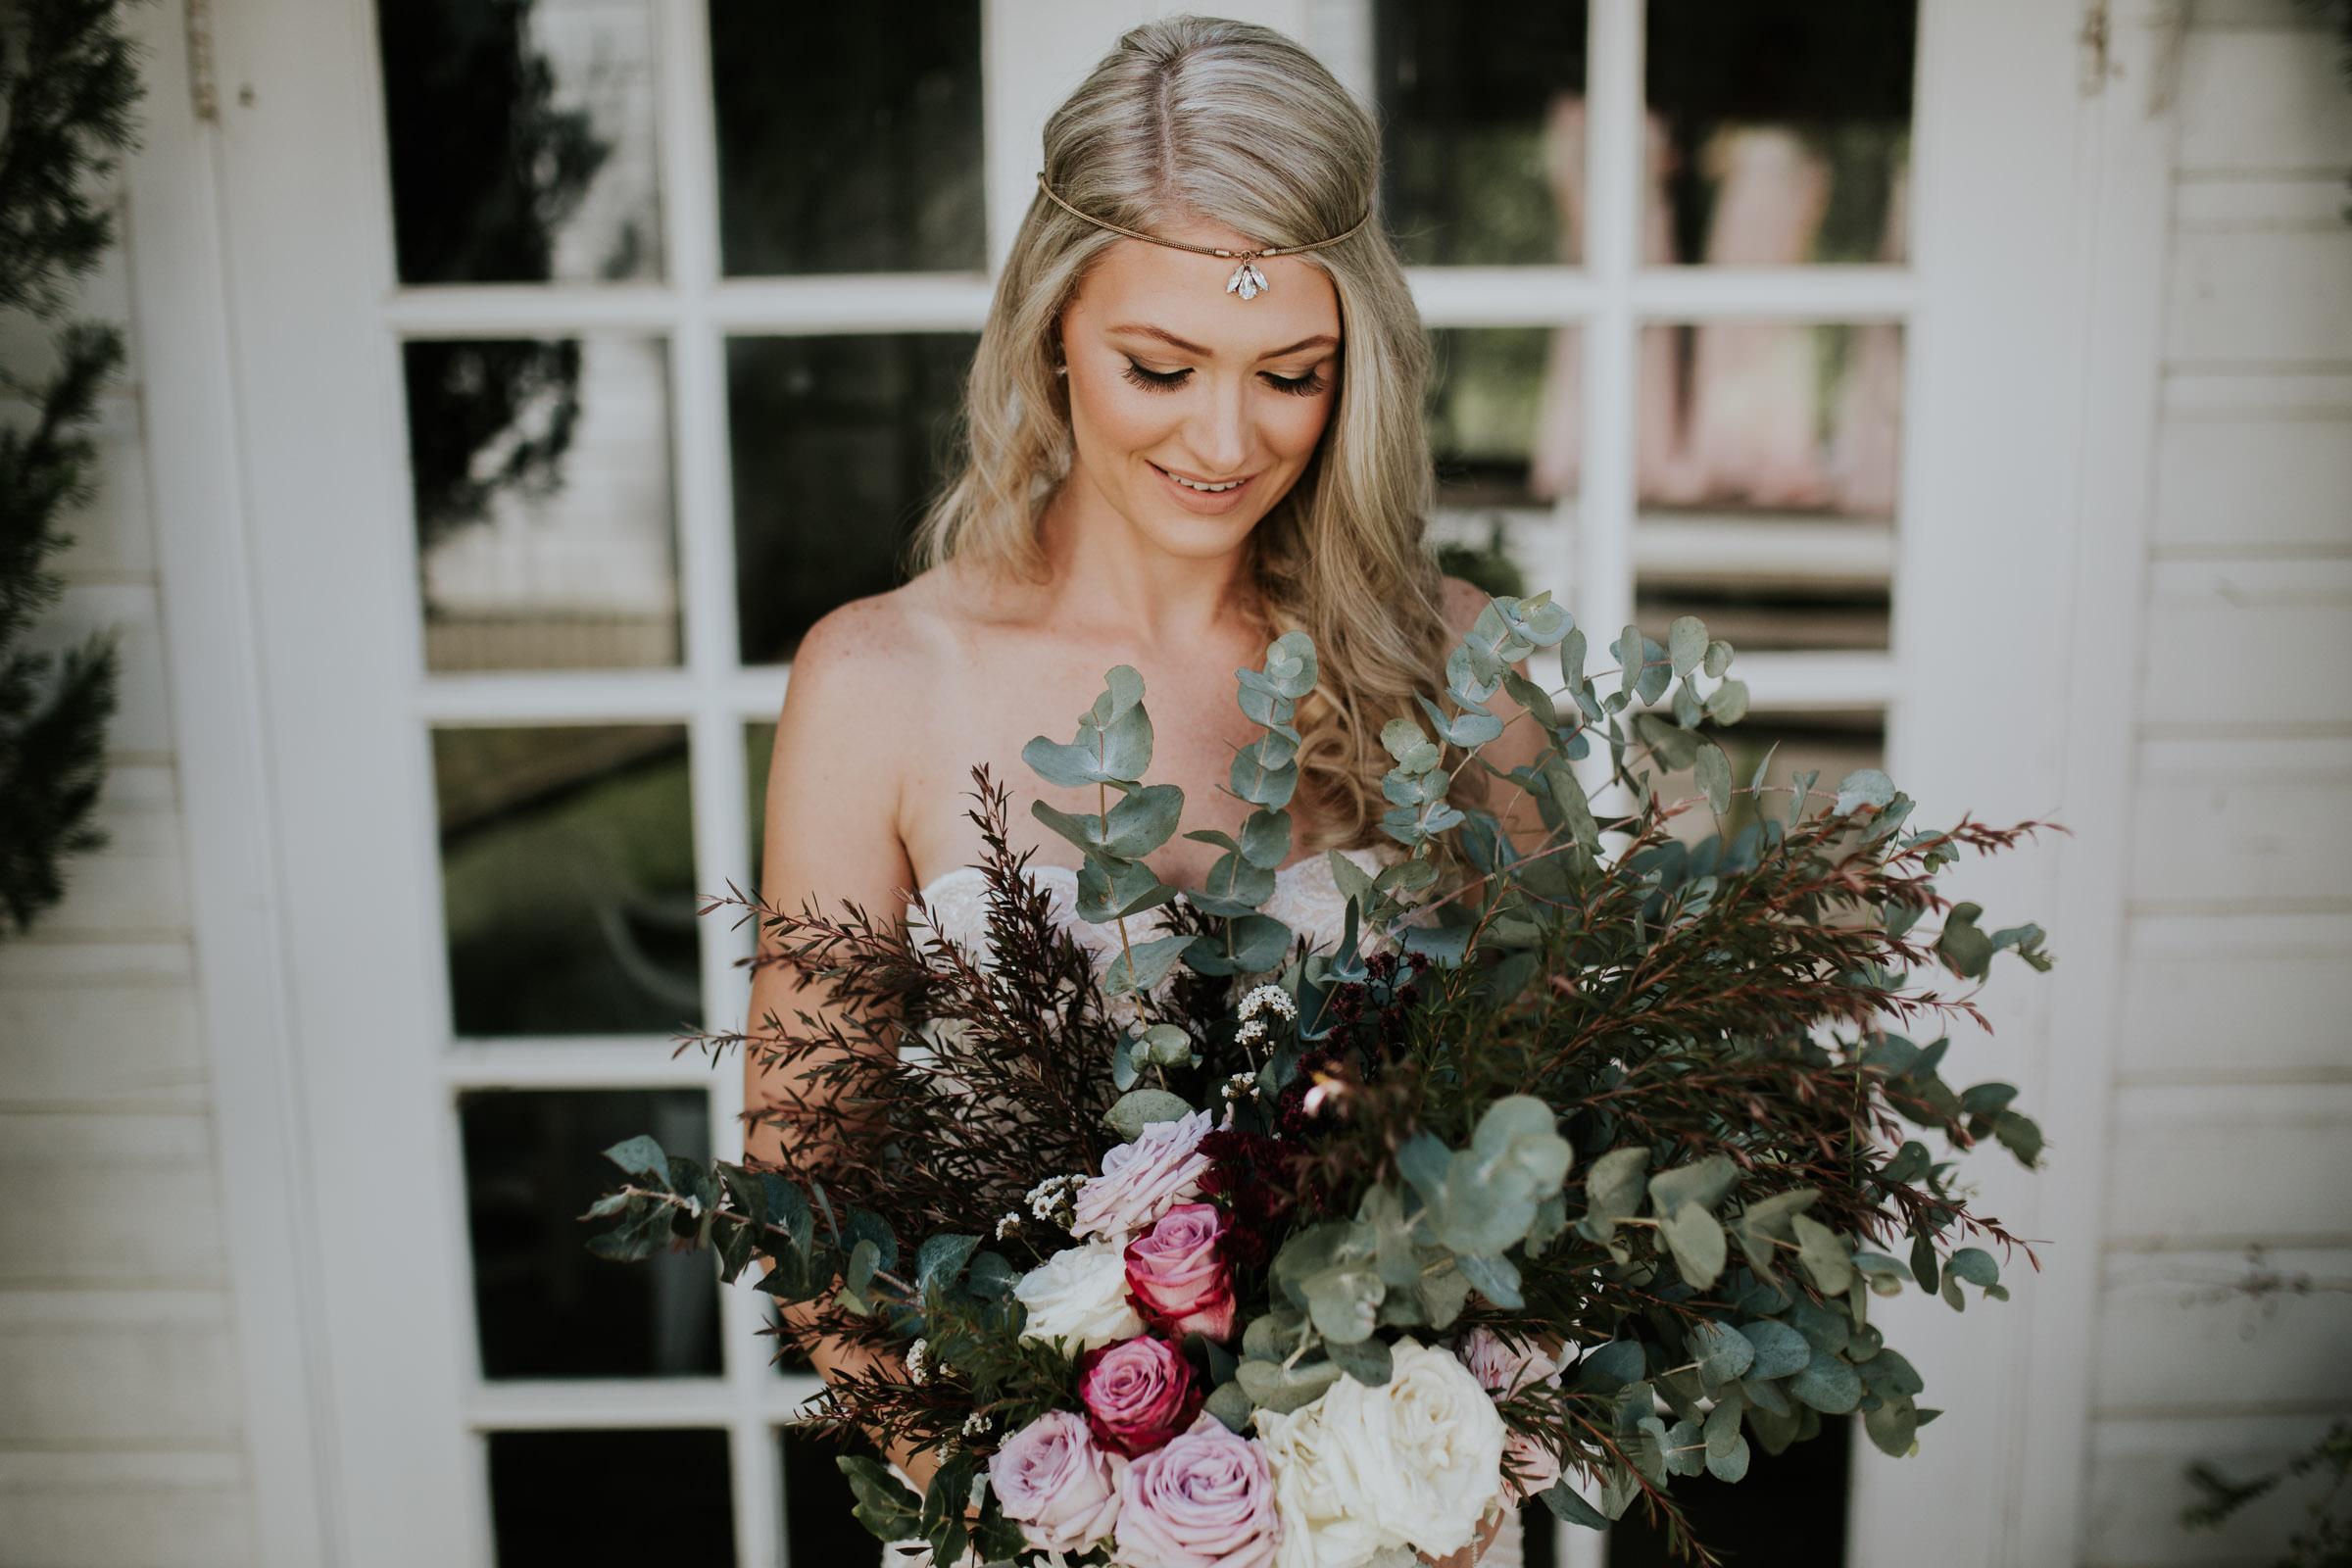 Emma+John+Far+South+Coast+Wedding+Festivl+Glamping+Bush-63.jpg